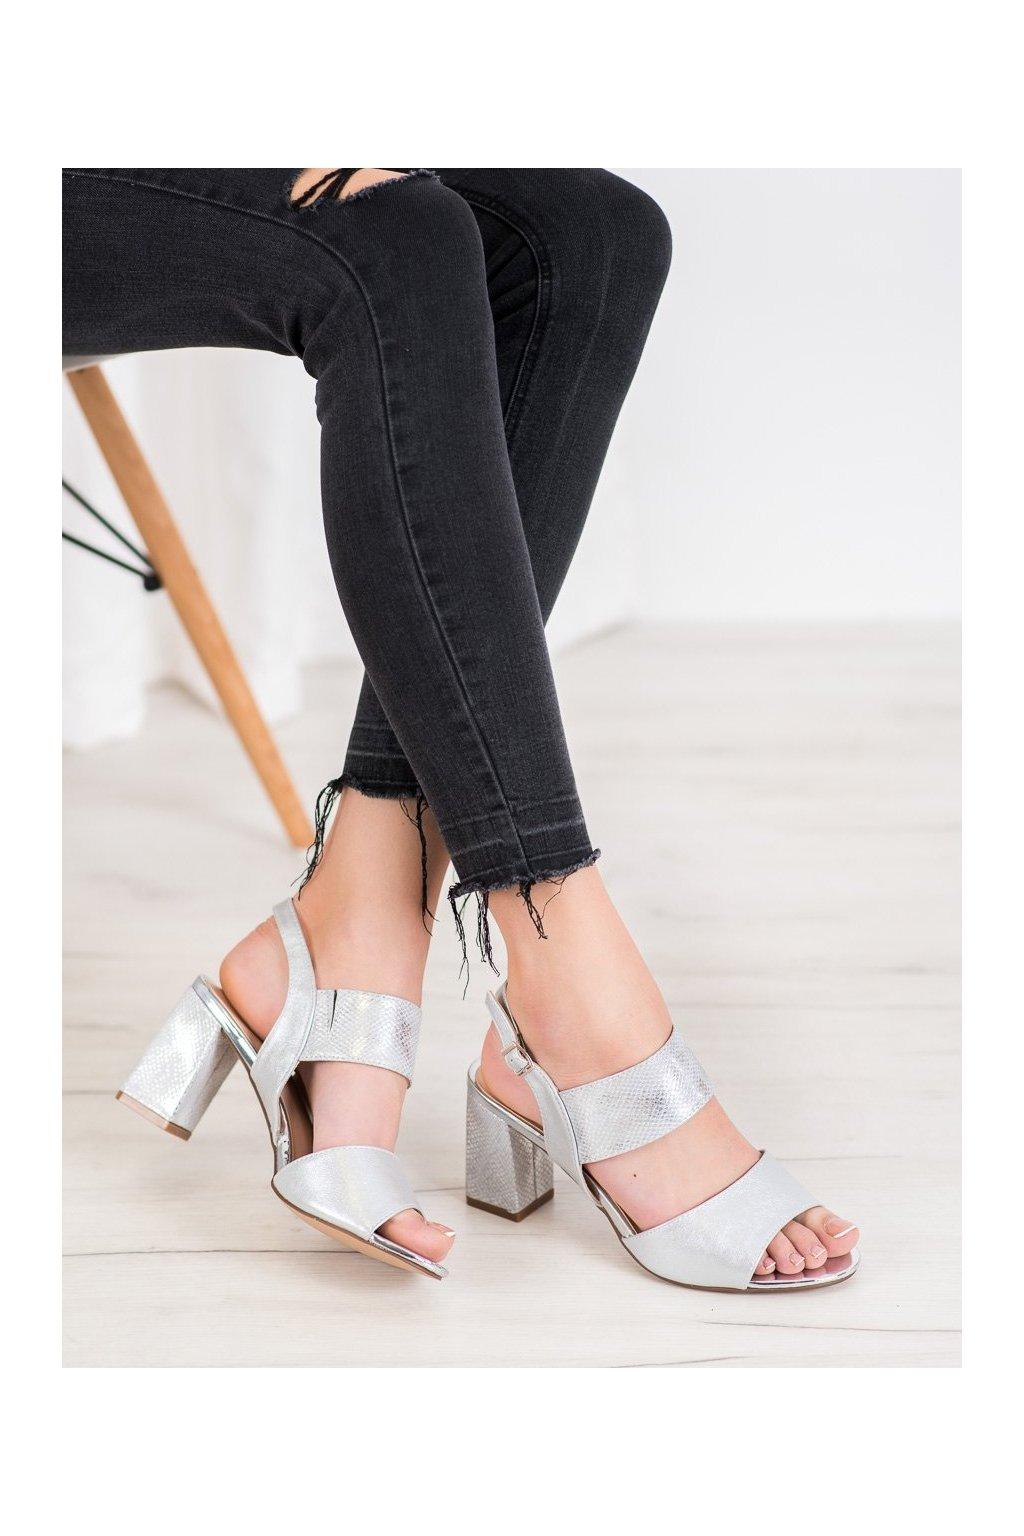 Sivé sandále Vinceza kod YQE20-17081S